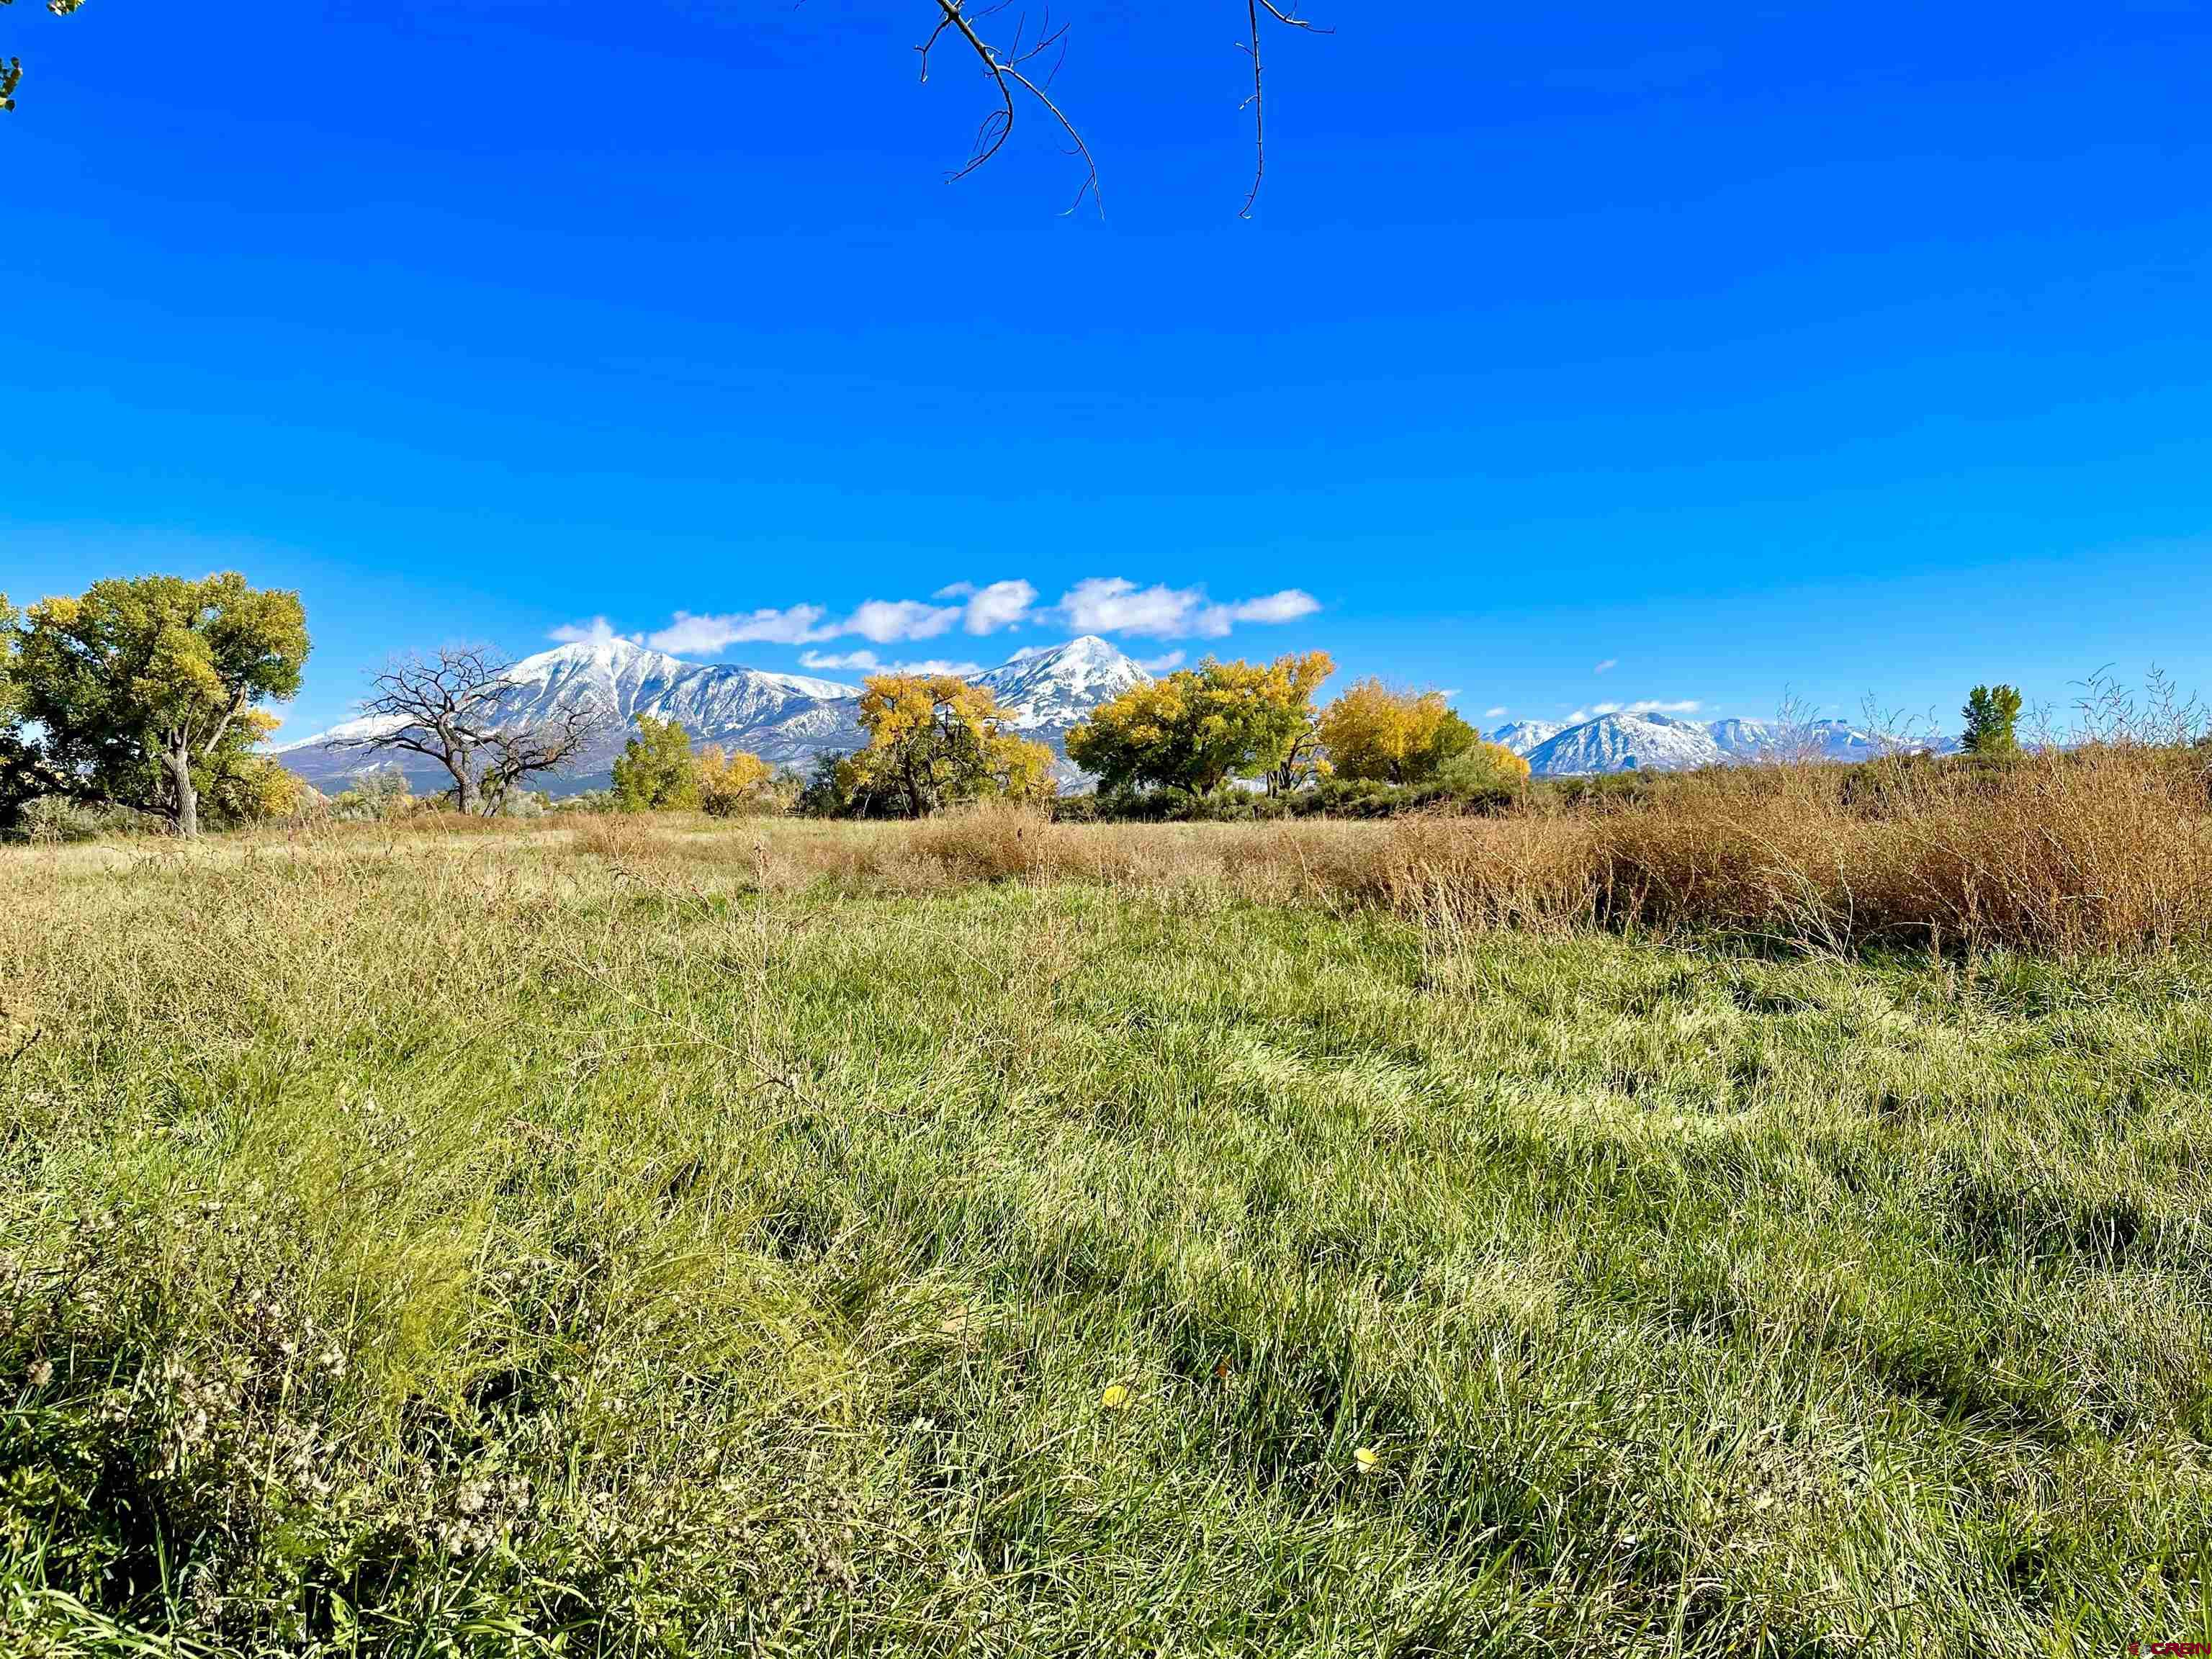 35971 Back River Road, Hotchkiss, CO 81419